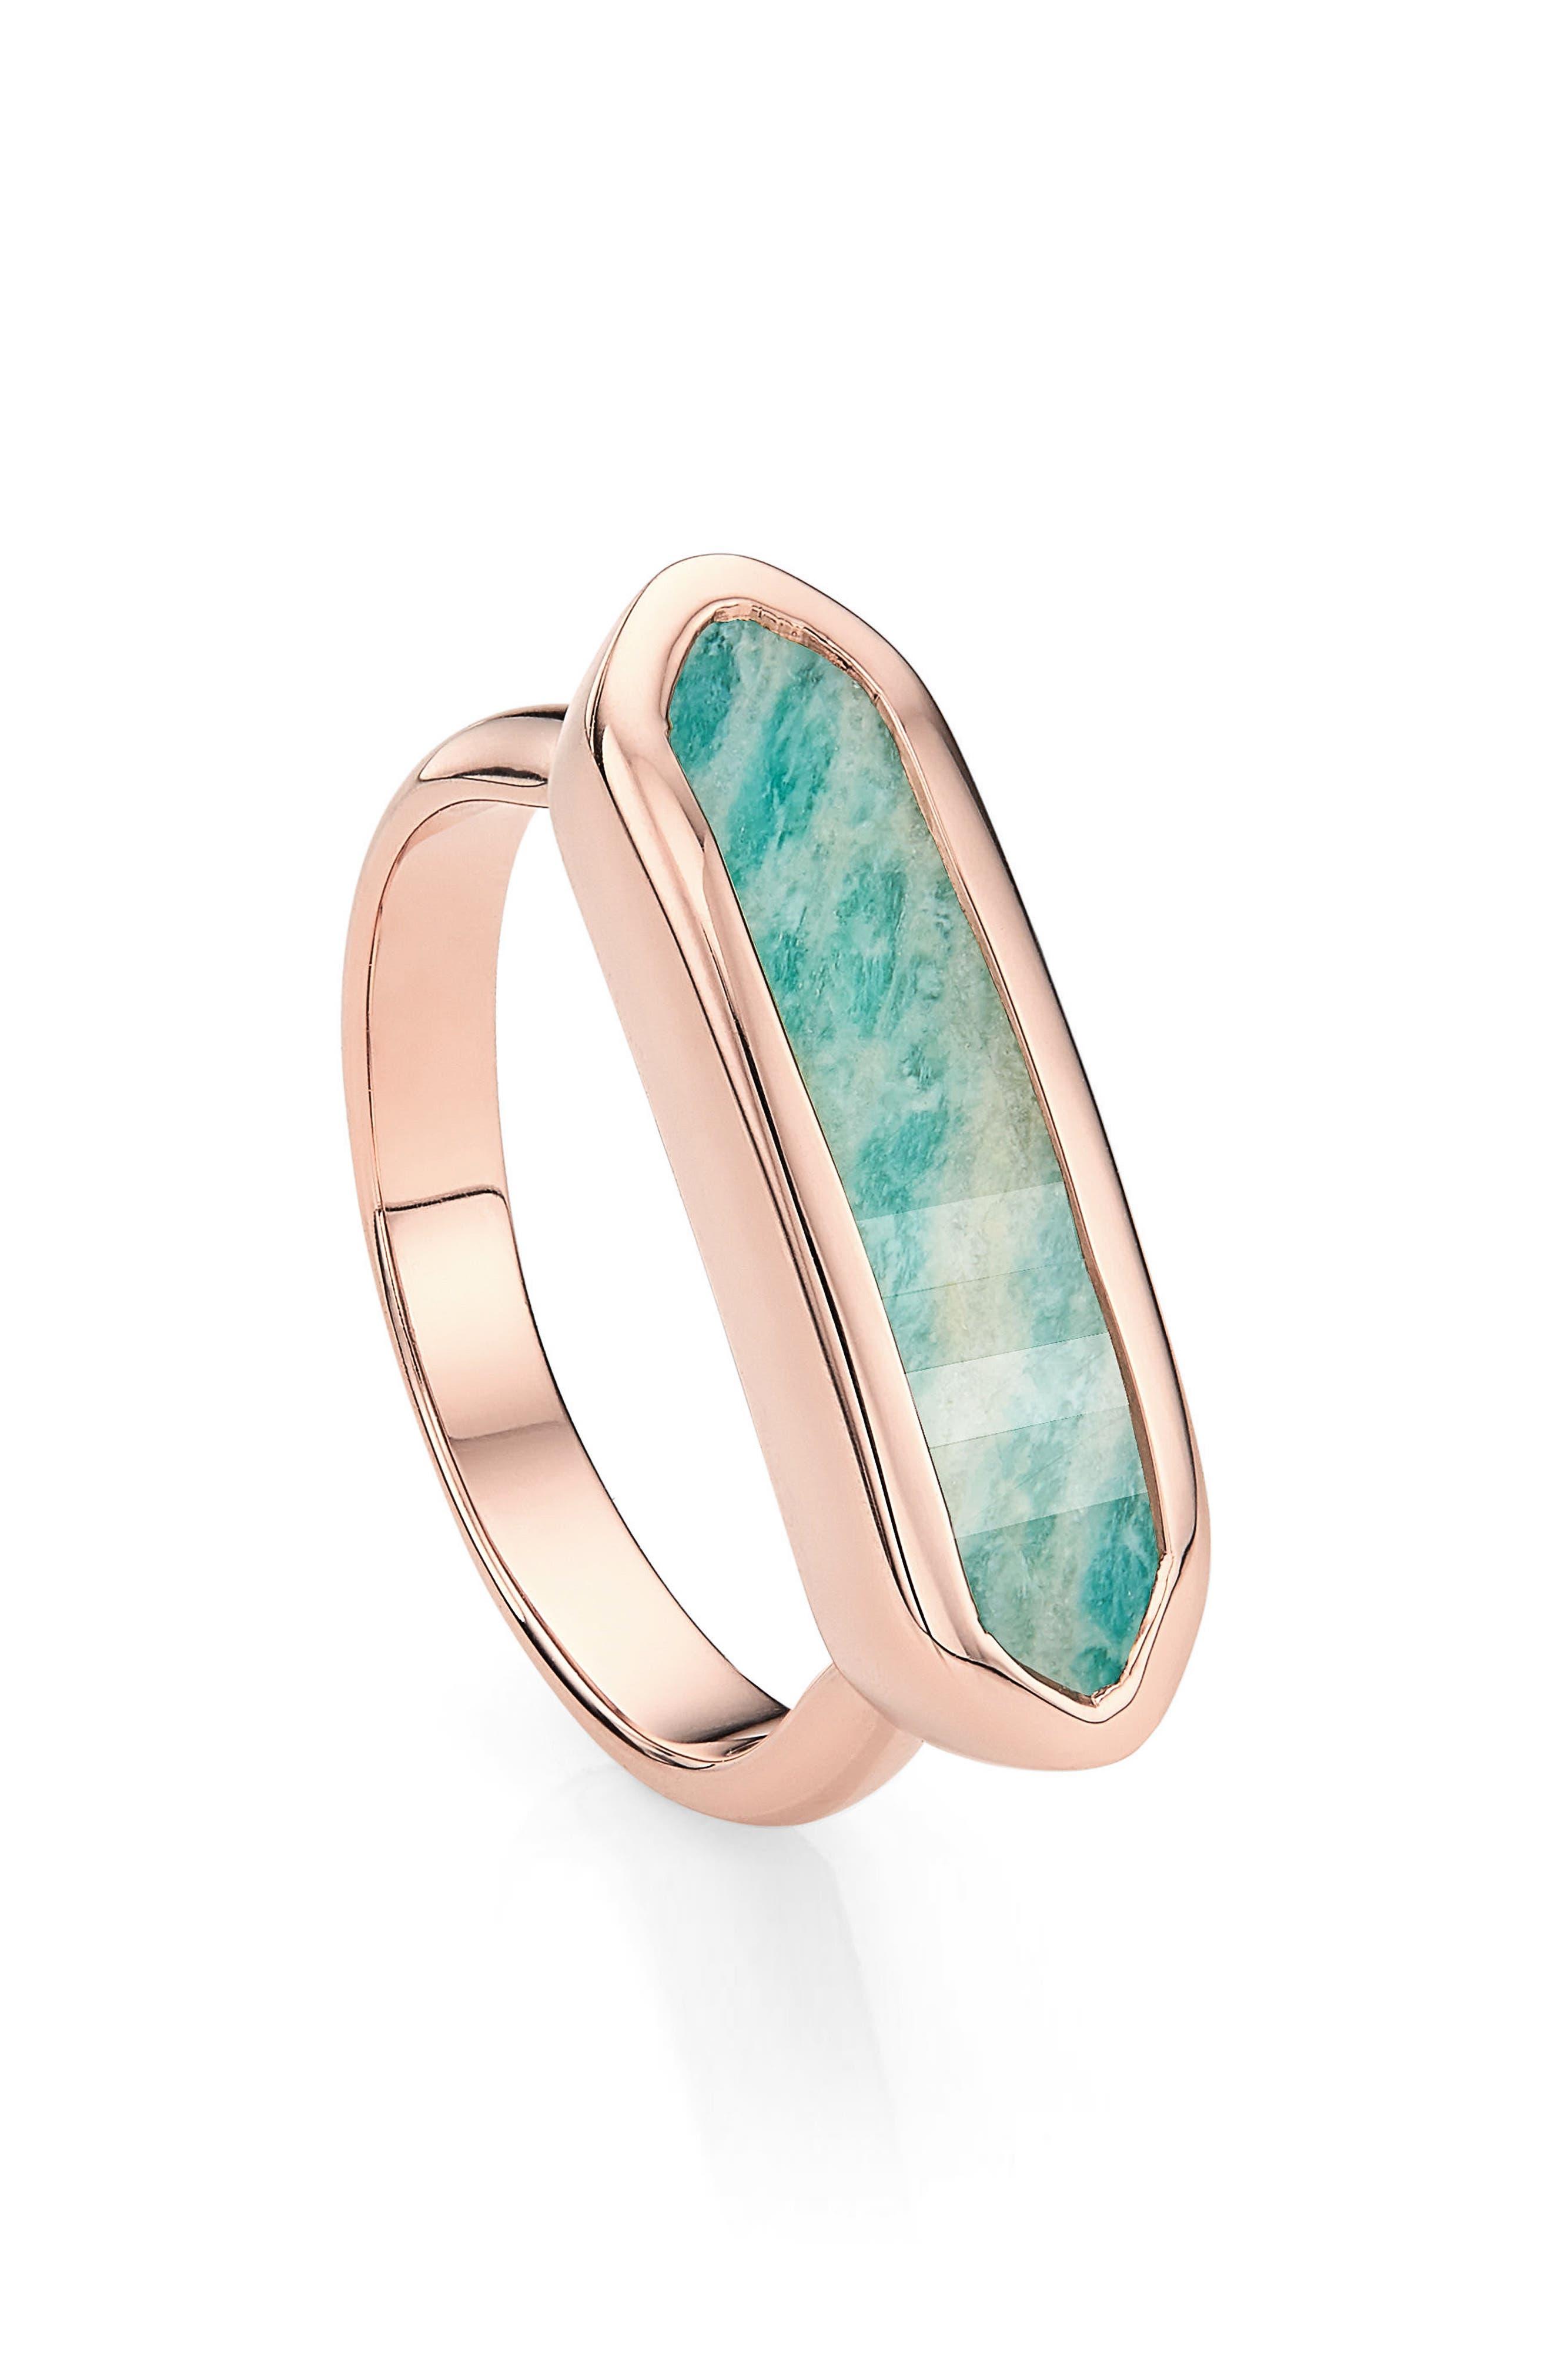 MONICA VINADER Baja Grey Agate Ring, Main, color, ROSE GOLD